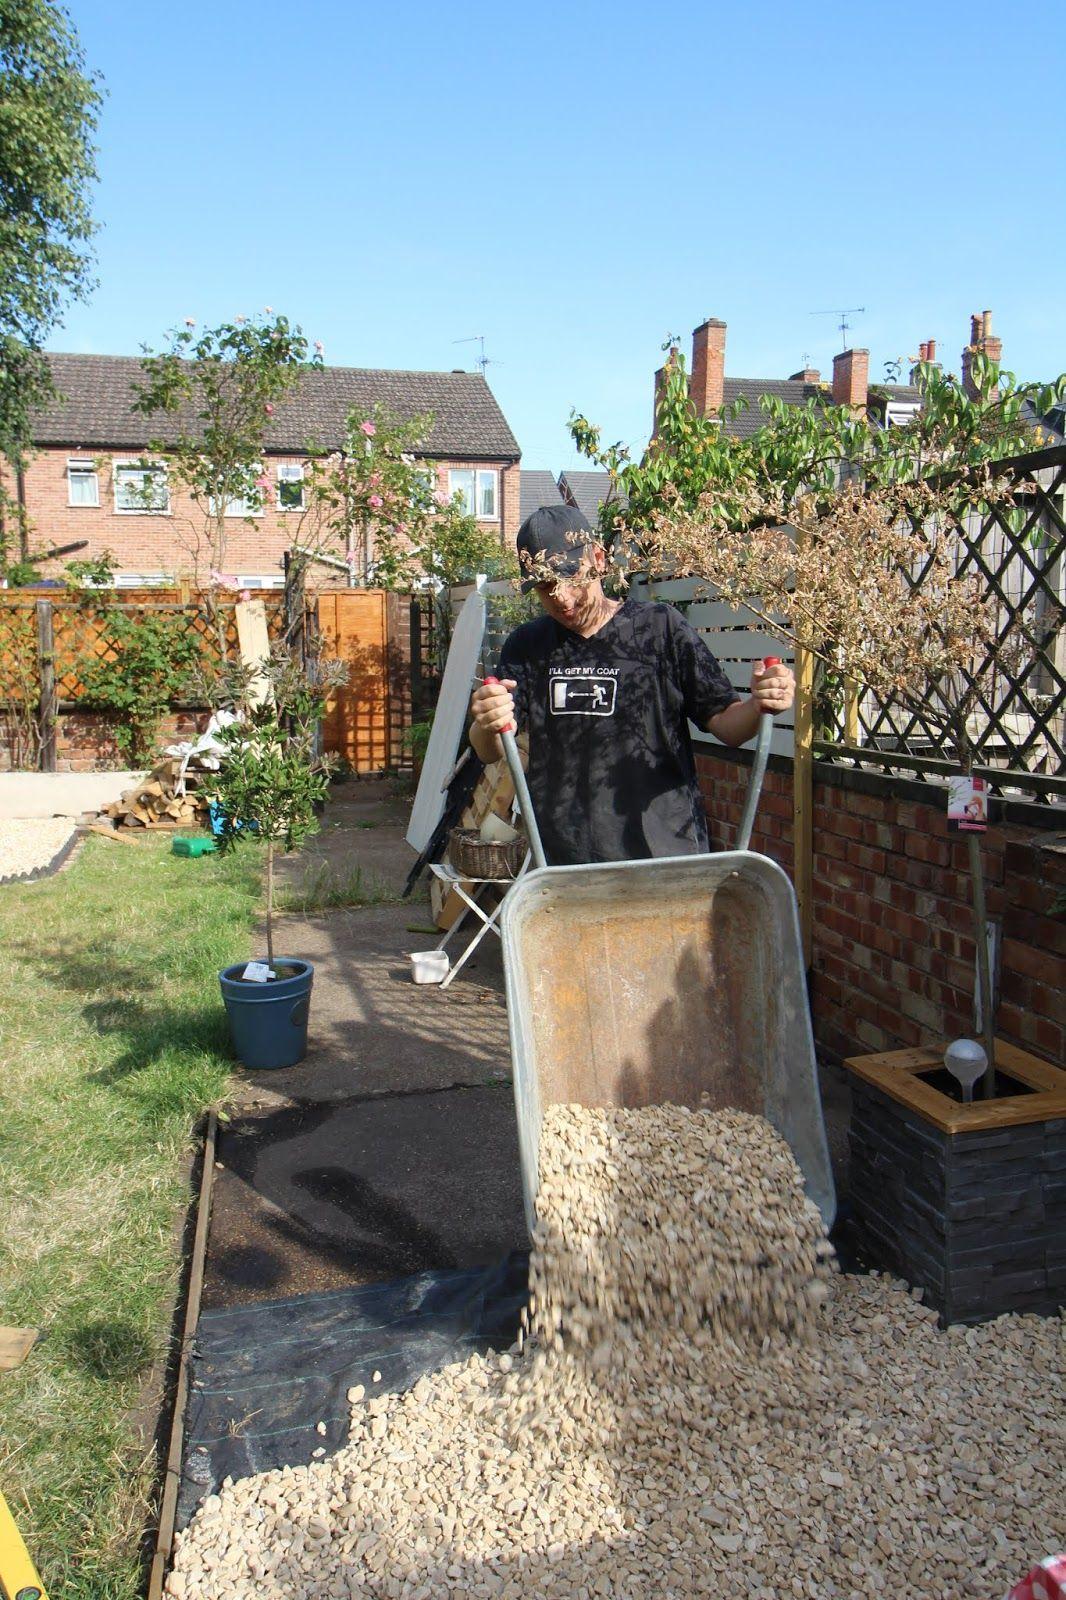 Laying Gravel In the Garden - Kezzabeth | DIY & Renovation ...